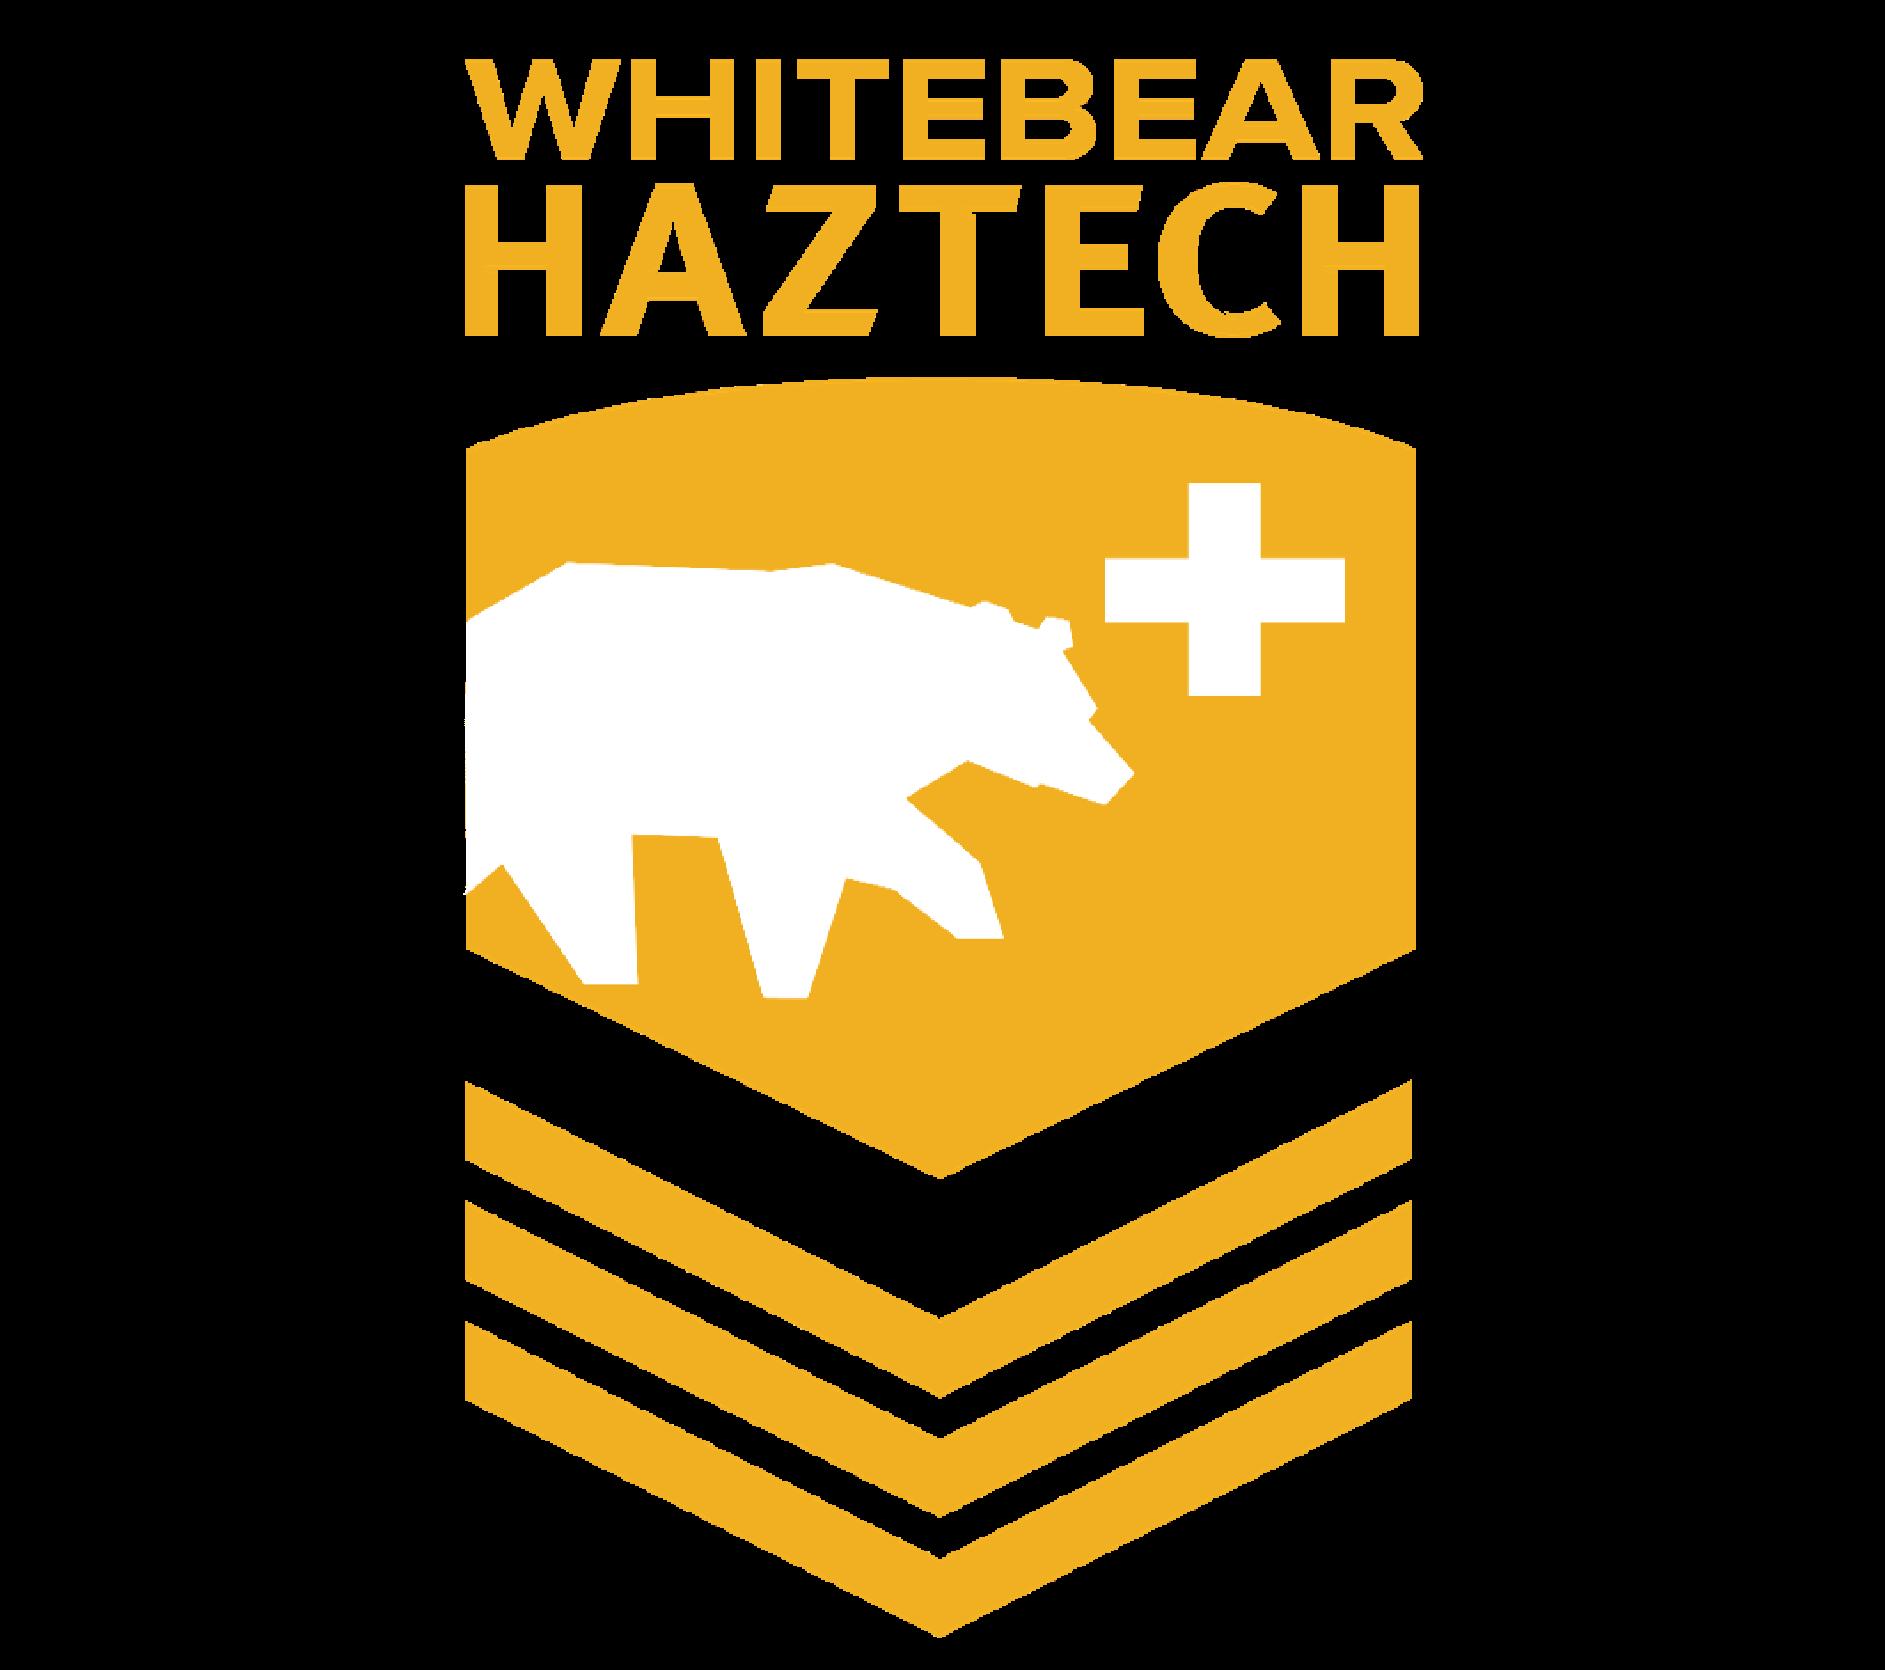 Whitebear Haztech_Indigenous Companies